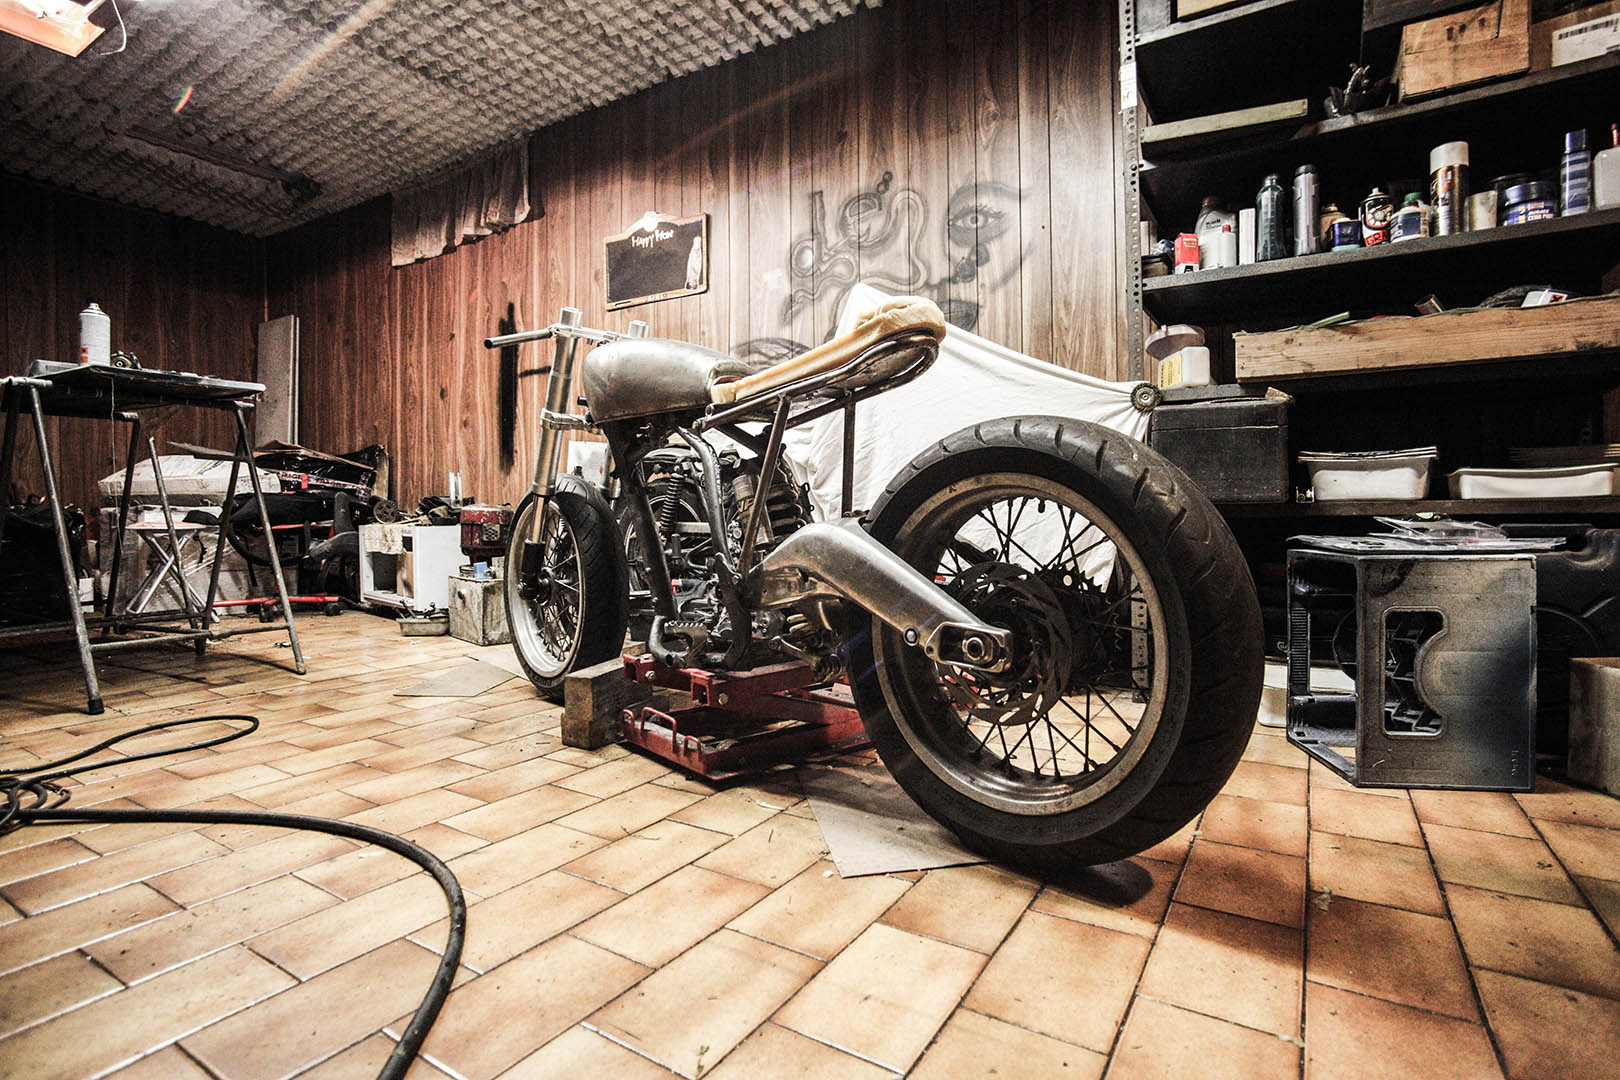 Oficina de Moto em Hell's Kitchen Beginners-short-guide-on-motorcycle-repair-tool-basics-114462_1